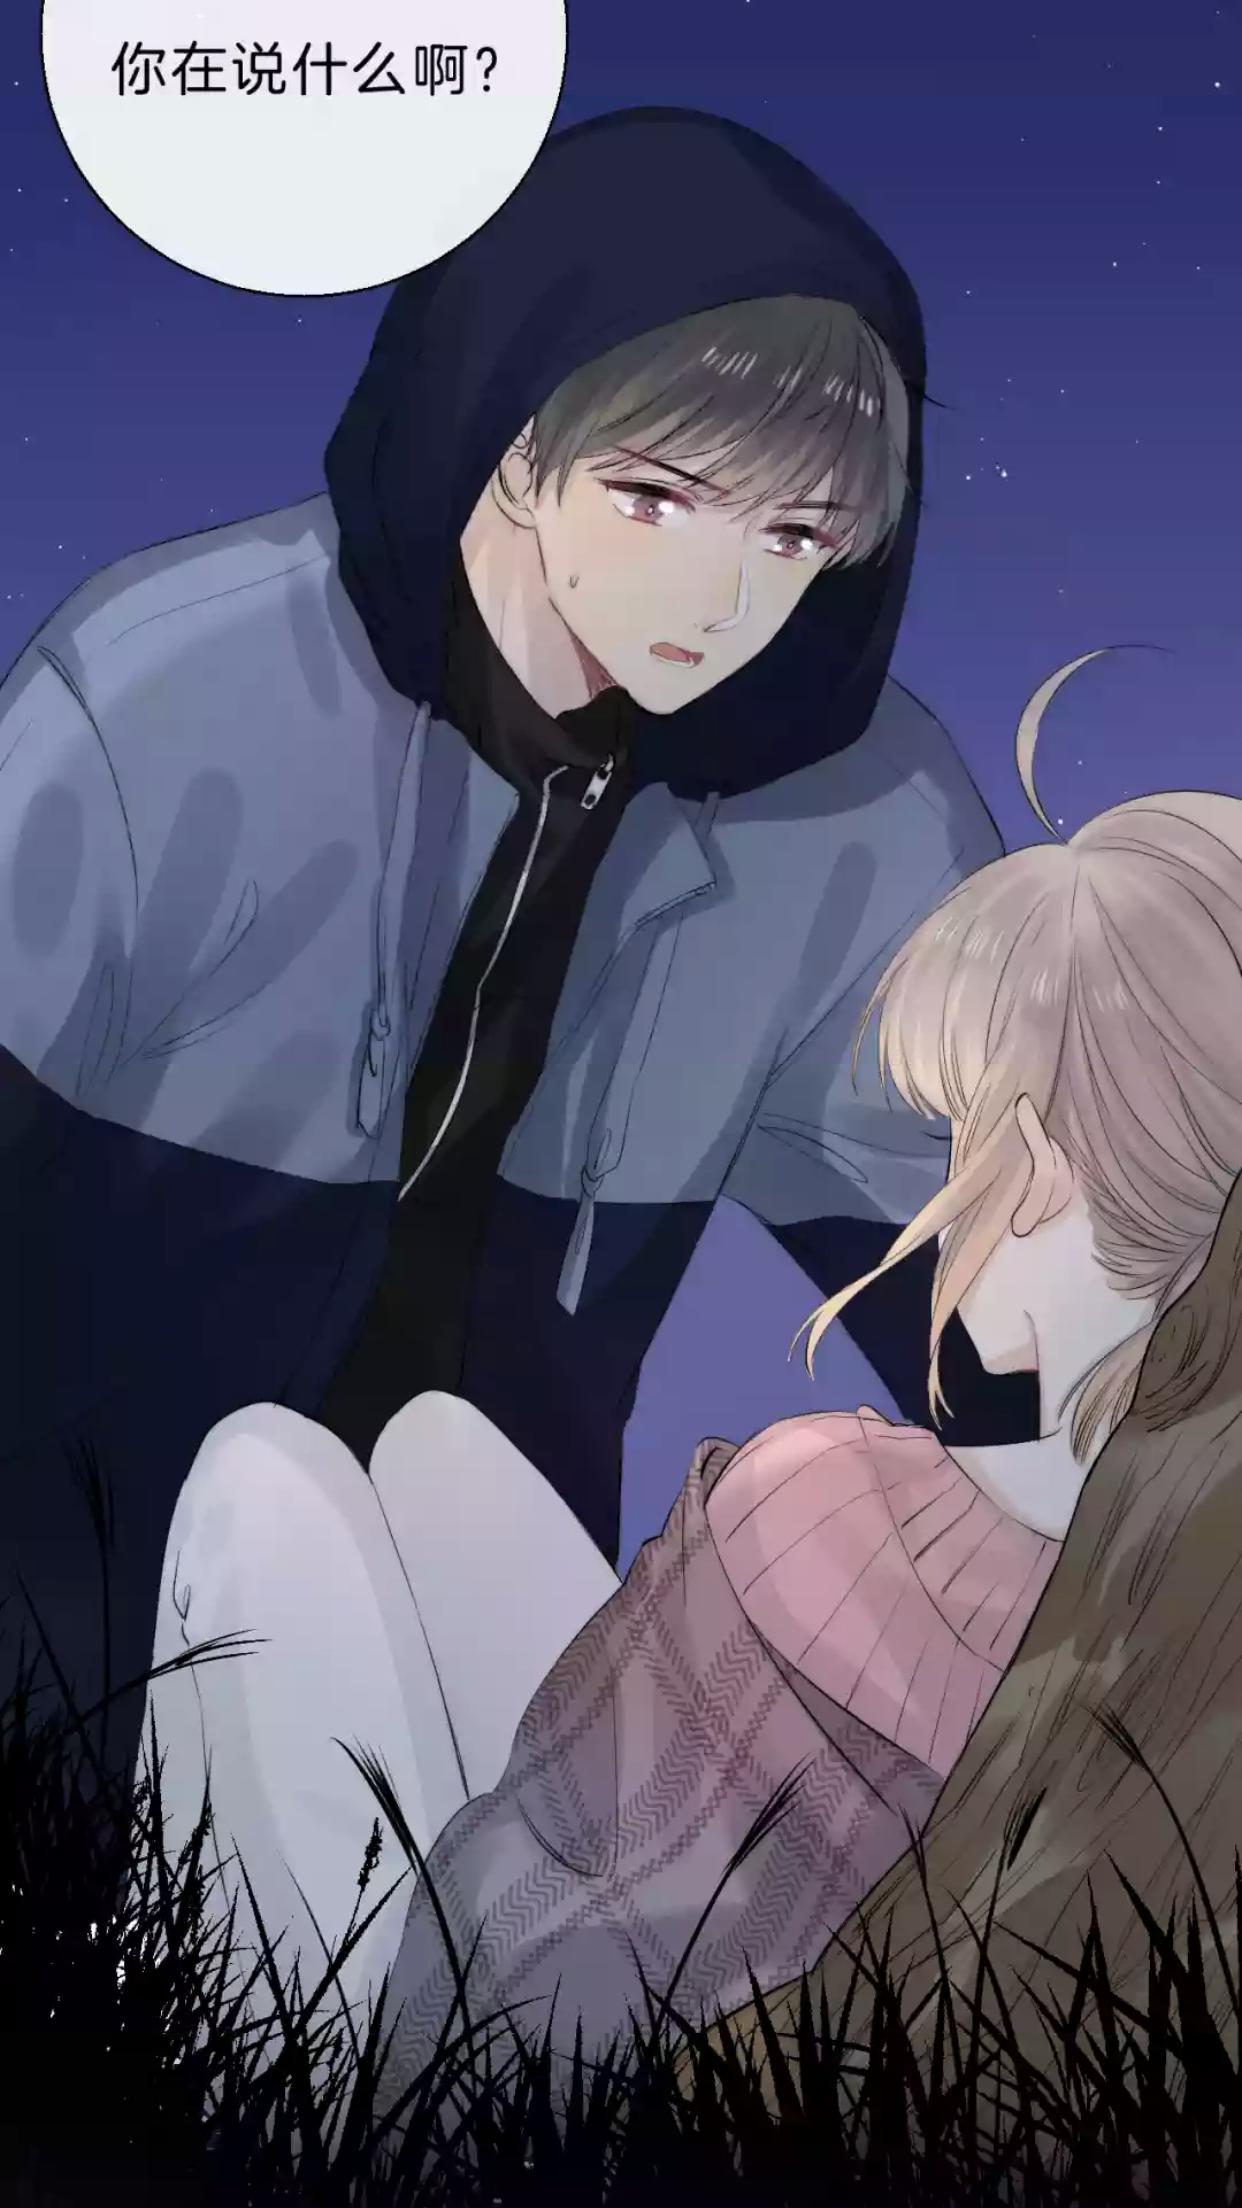 Idea by Animemangaluver on Gradually Close to the Heart